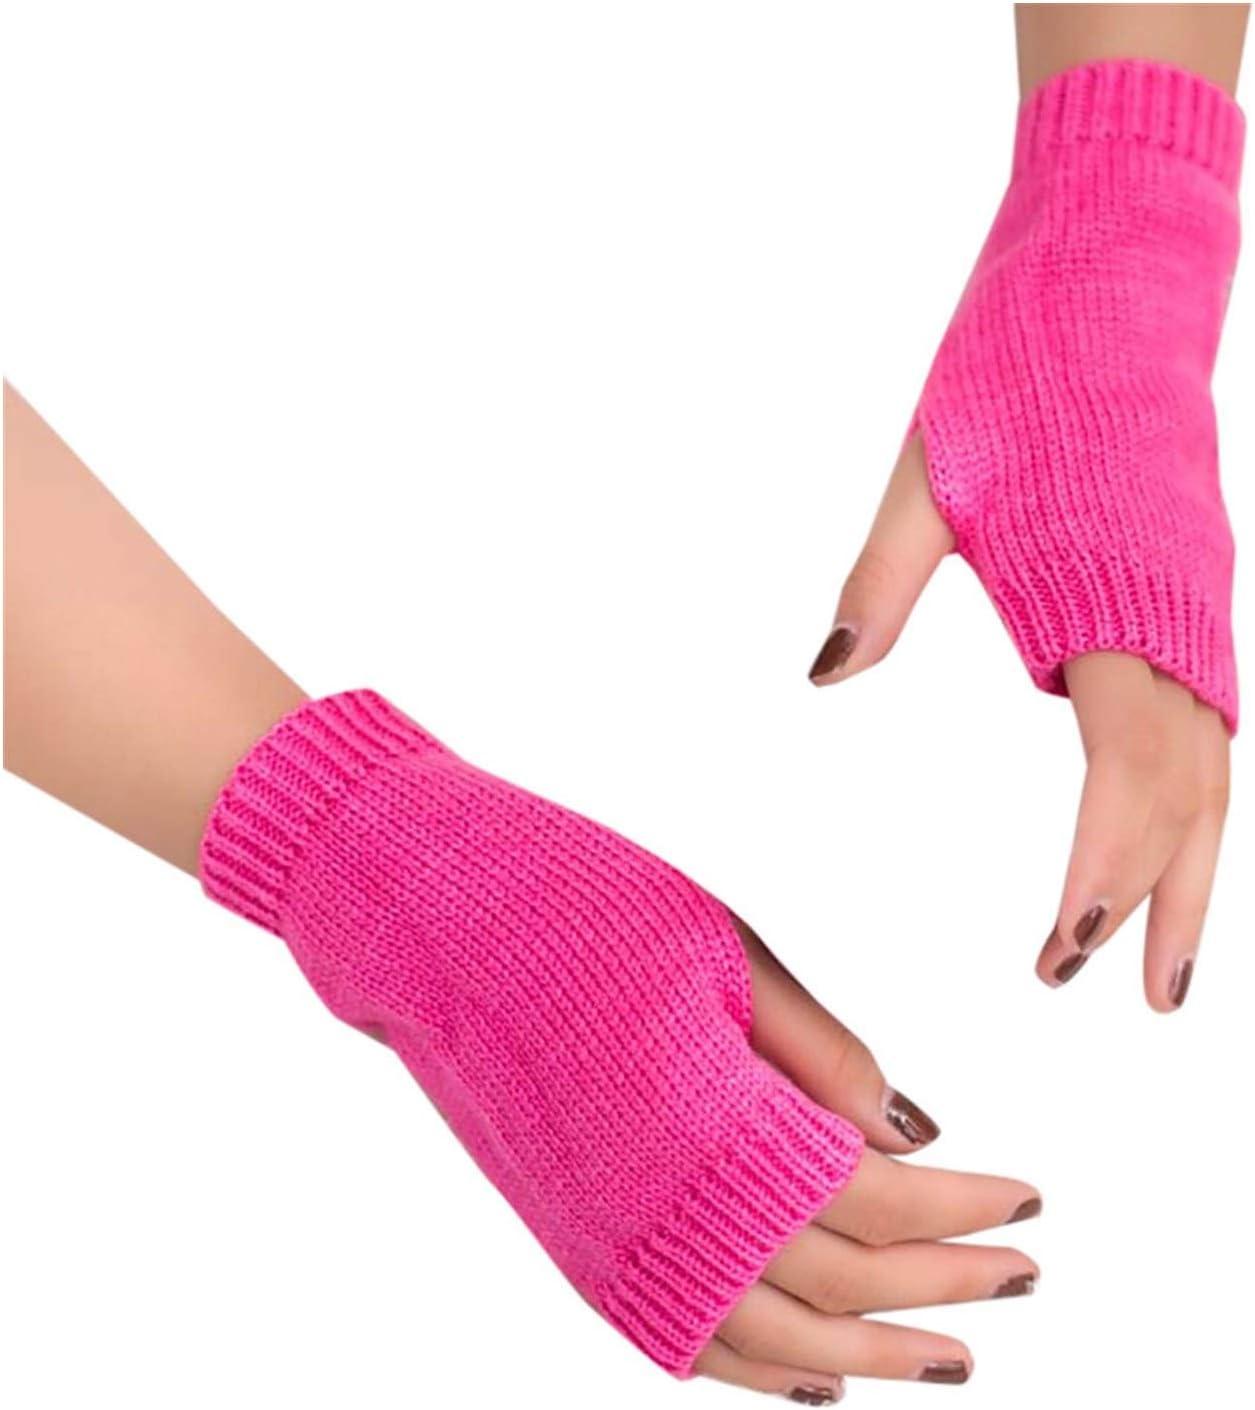 ZZTT Autumn and Winter Gloves 1 Pair of Cold-Proof Gloves Distaff Ladies Wrist Gloves Distaff Knitted Arm Fingerless Winter Warm Gloves Soft Warm Gloves Warm and Comfortable Gloves for Men or Momen